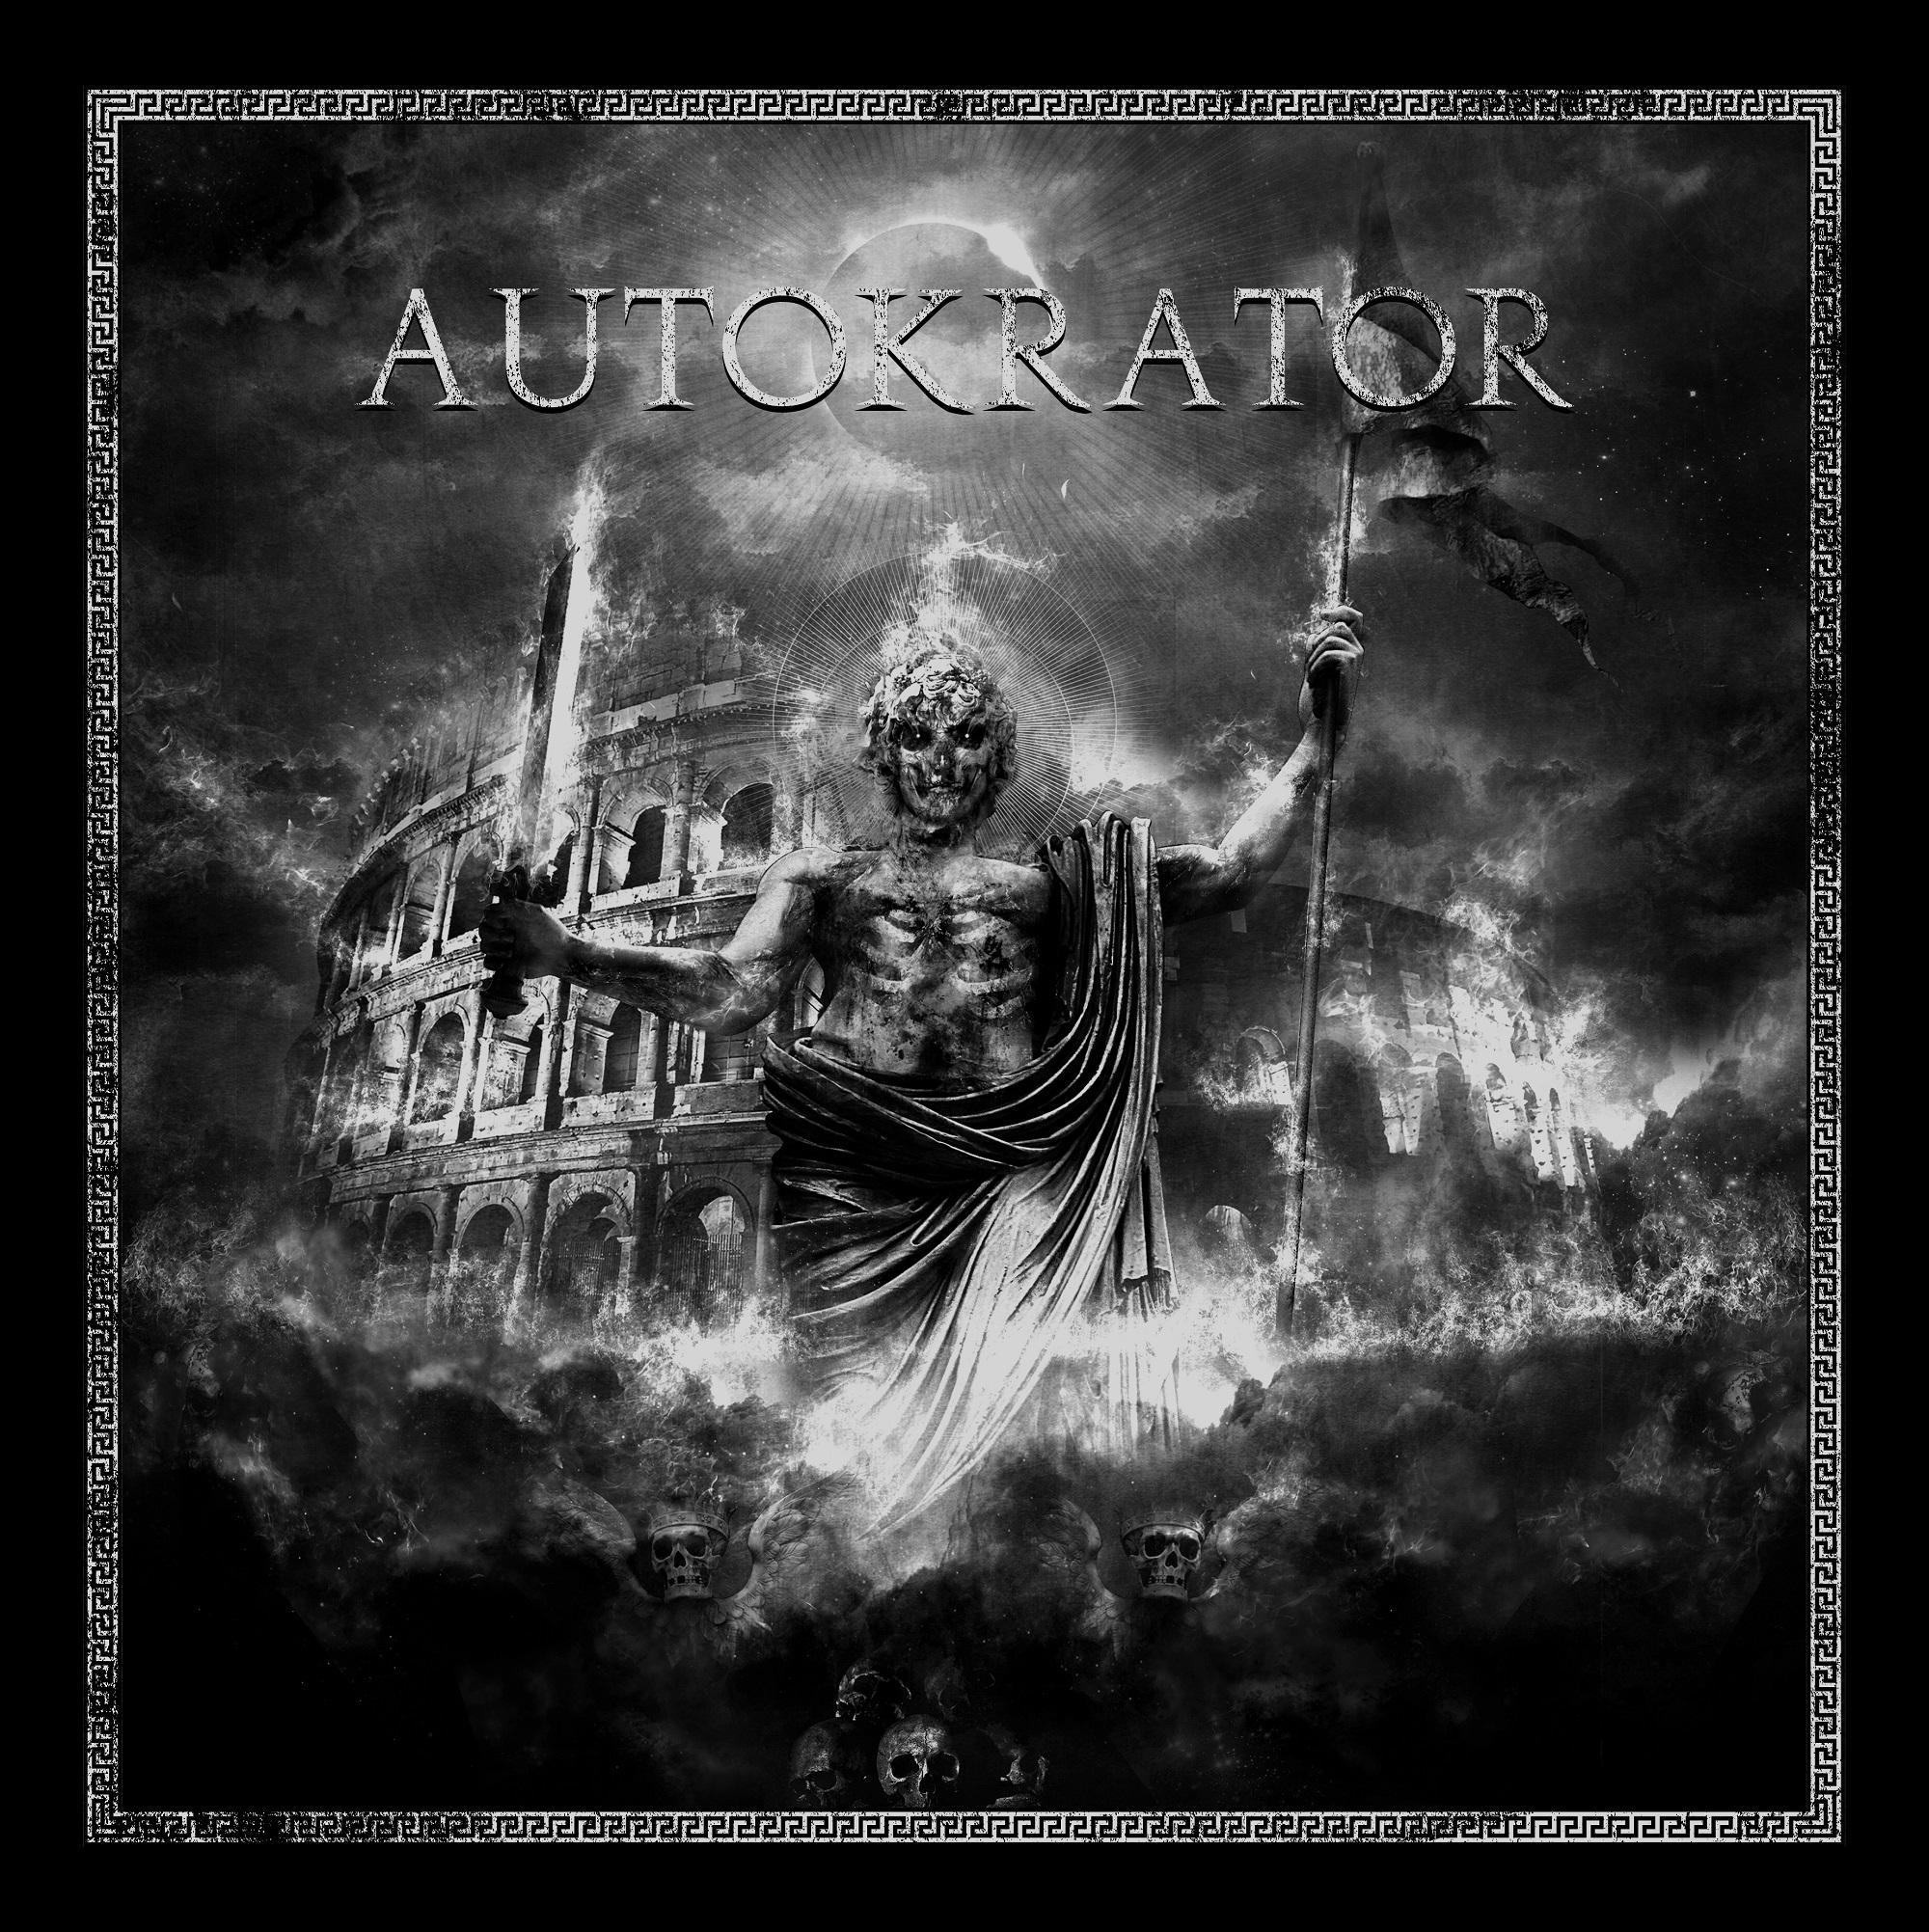 Autokrator – Autokrator Review